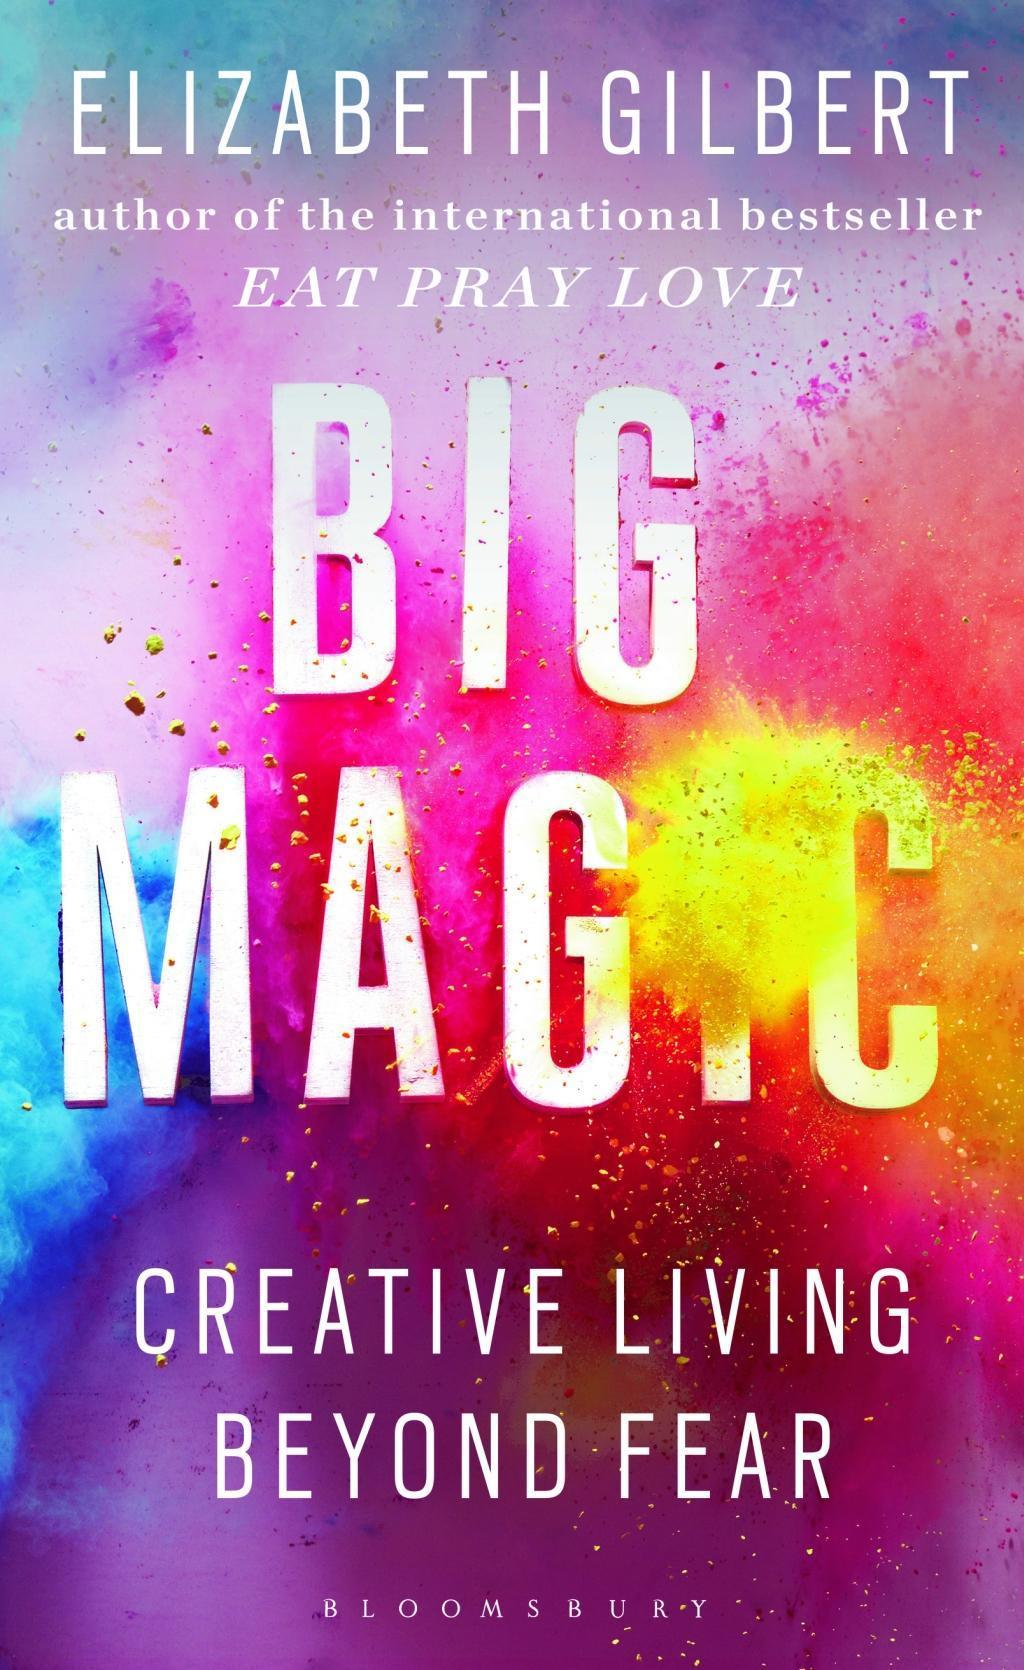 Online Book Store | Buy Books, Health & Wellbeing, Self Help, Creativity  Online in Australia - Fishpond.com.au